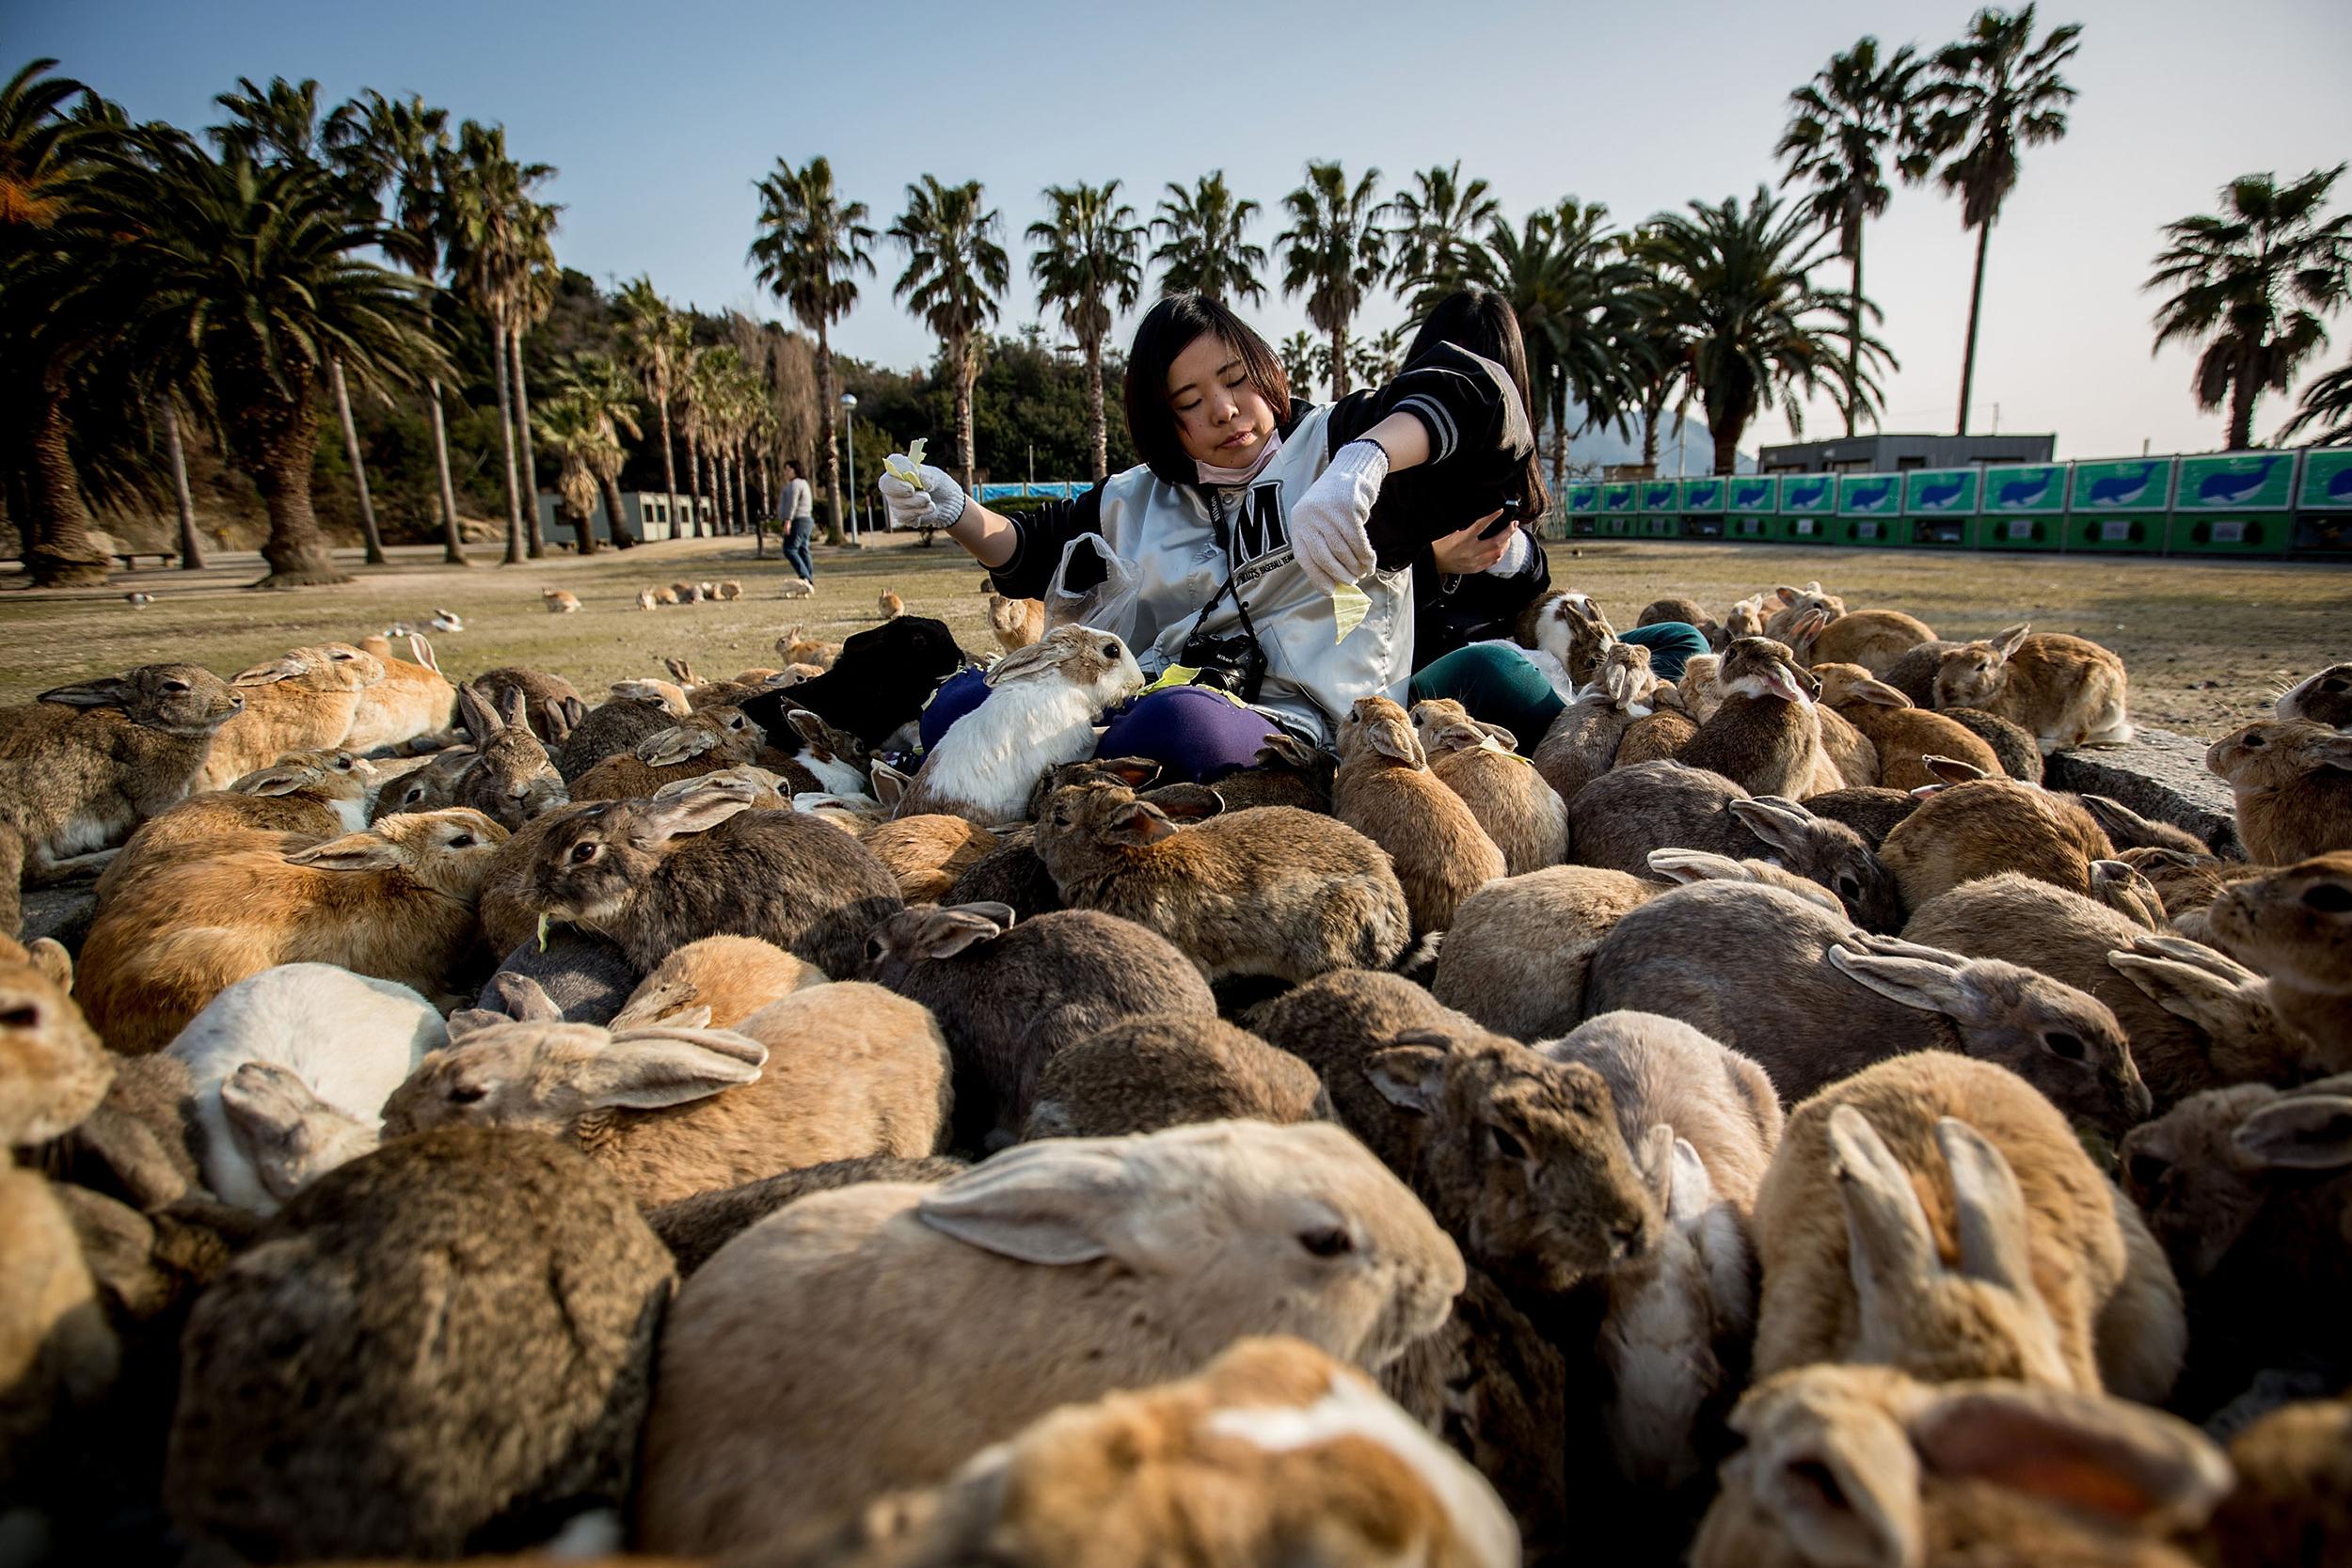 Two tourists sit and feed hundreds of rabbits  at Okunoshima Island on Feb. 24, 2014 in Takehara, Japan.